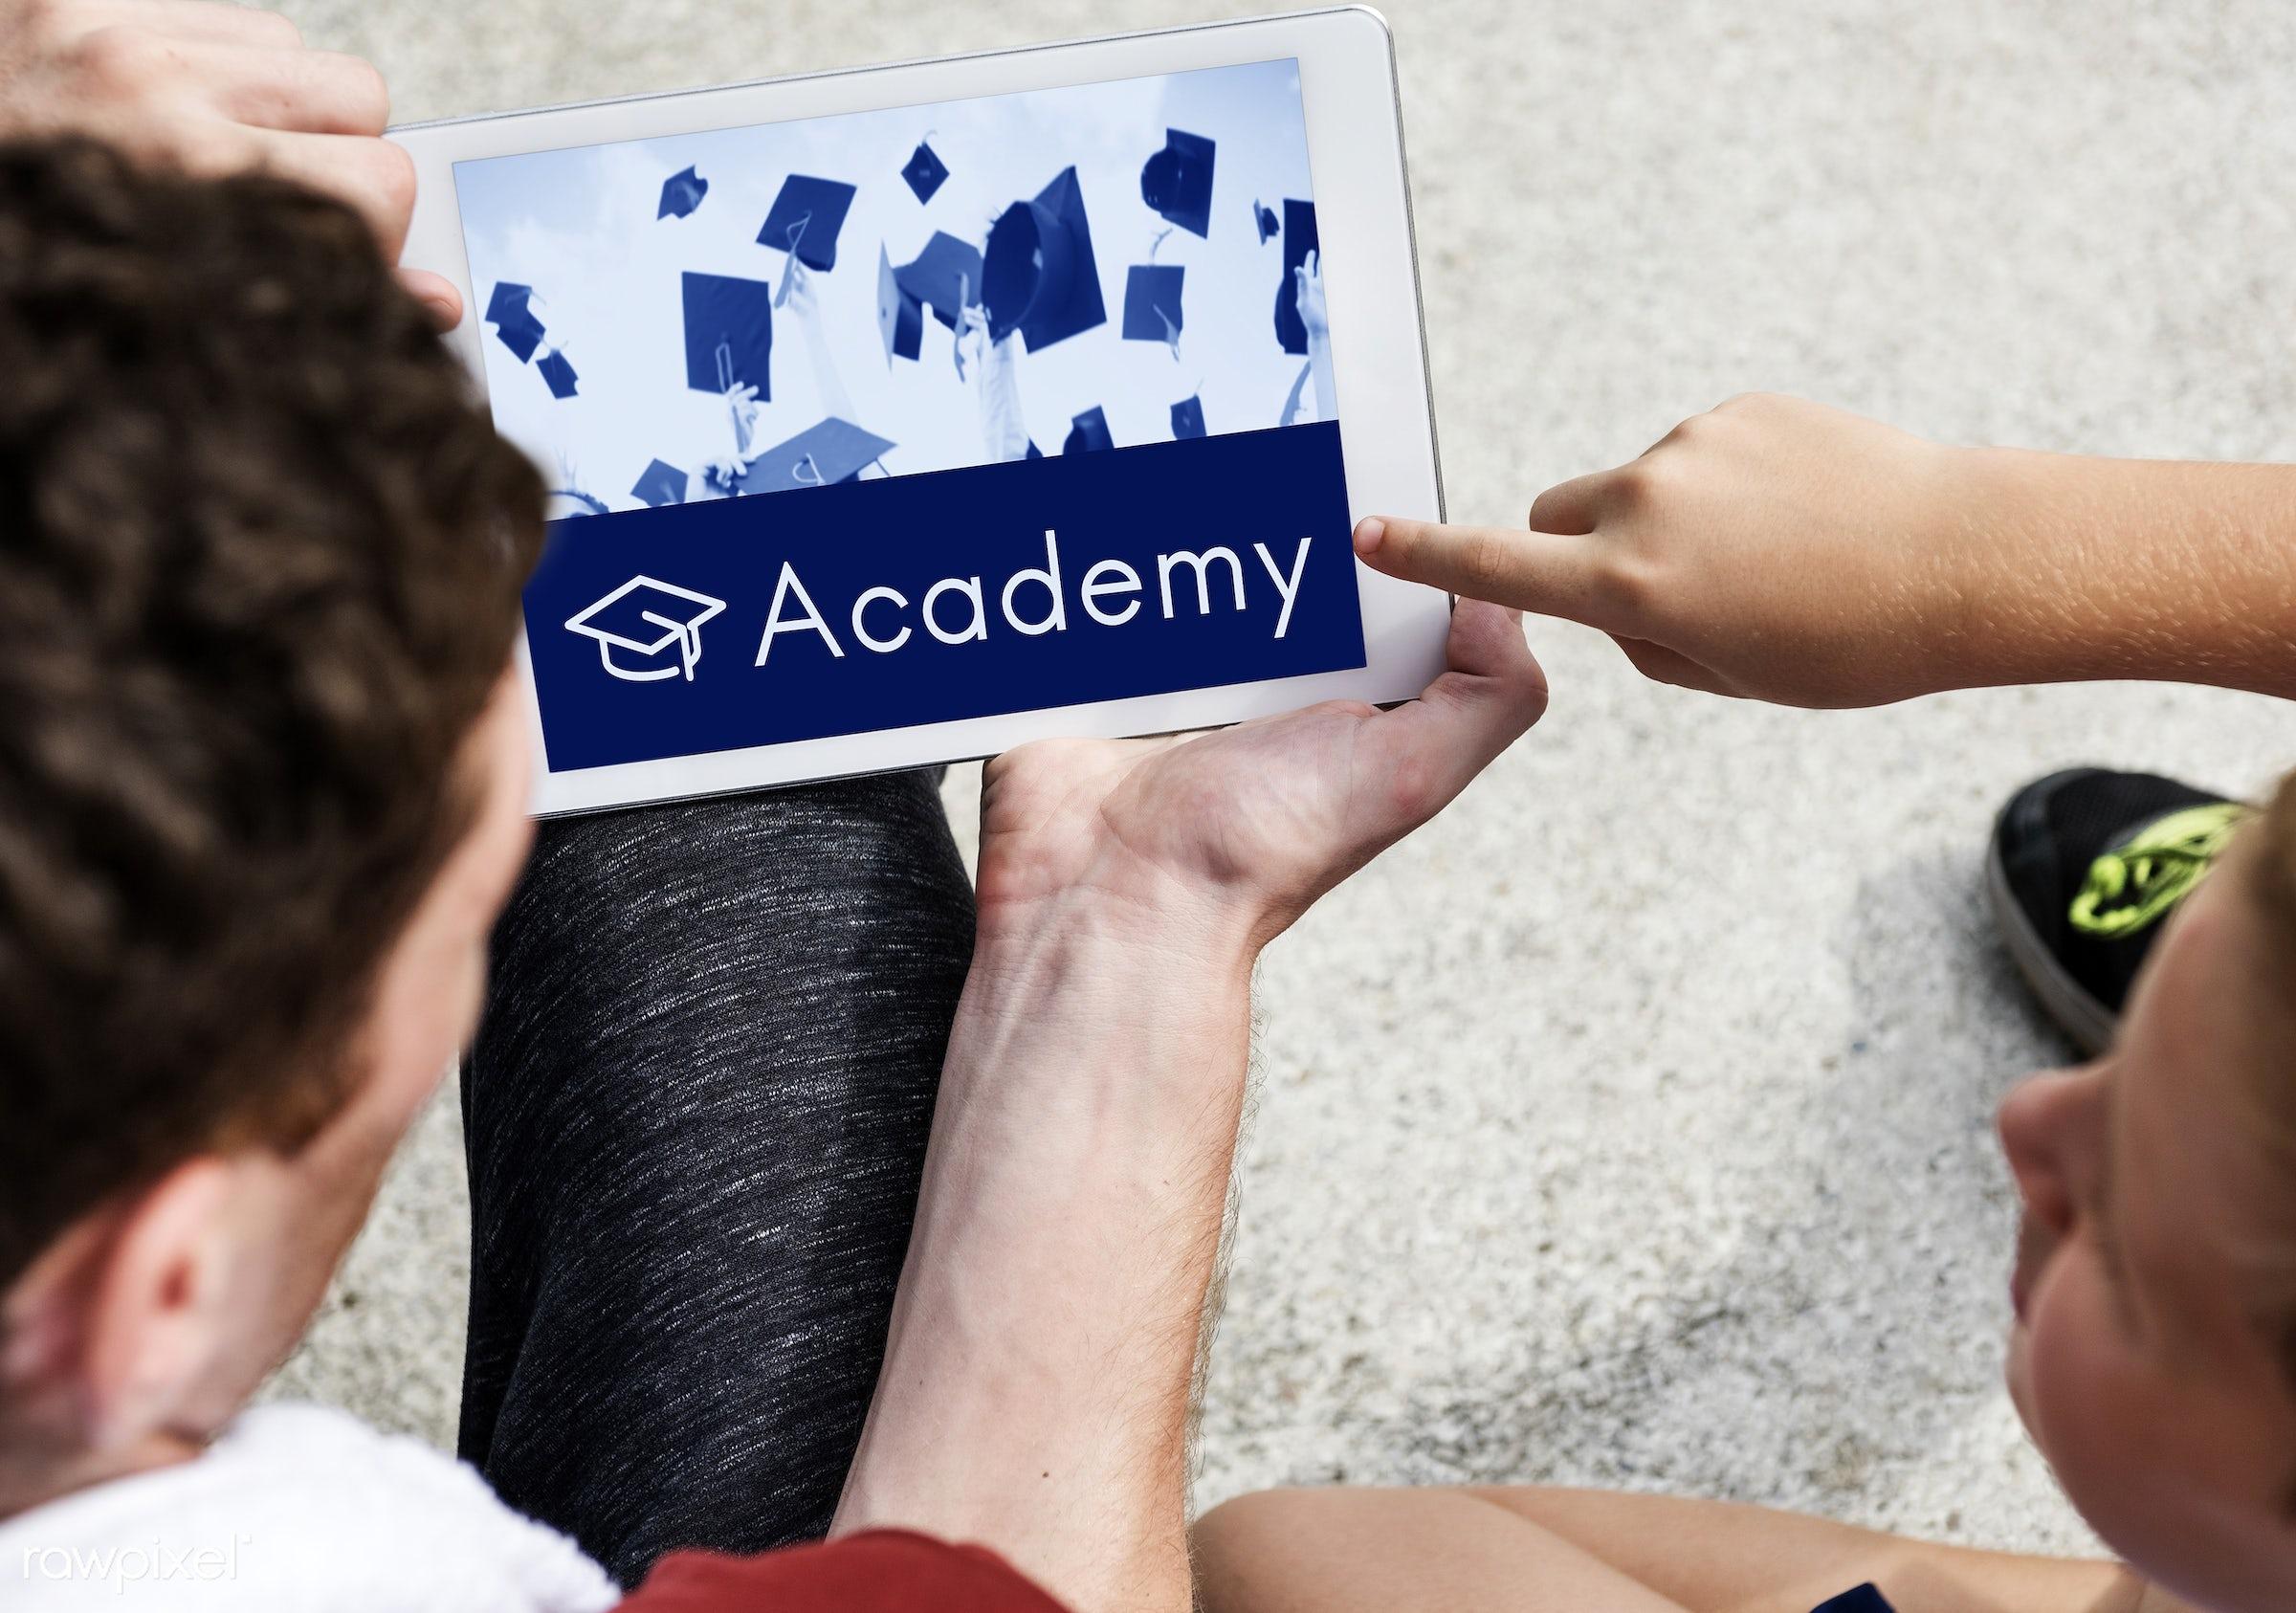 academics, academy, acquisition, adult, certification, college, curriculum, device, digital, digital device, digital tablet...